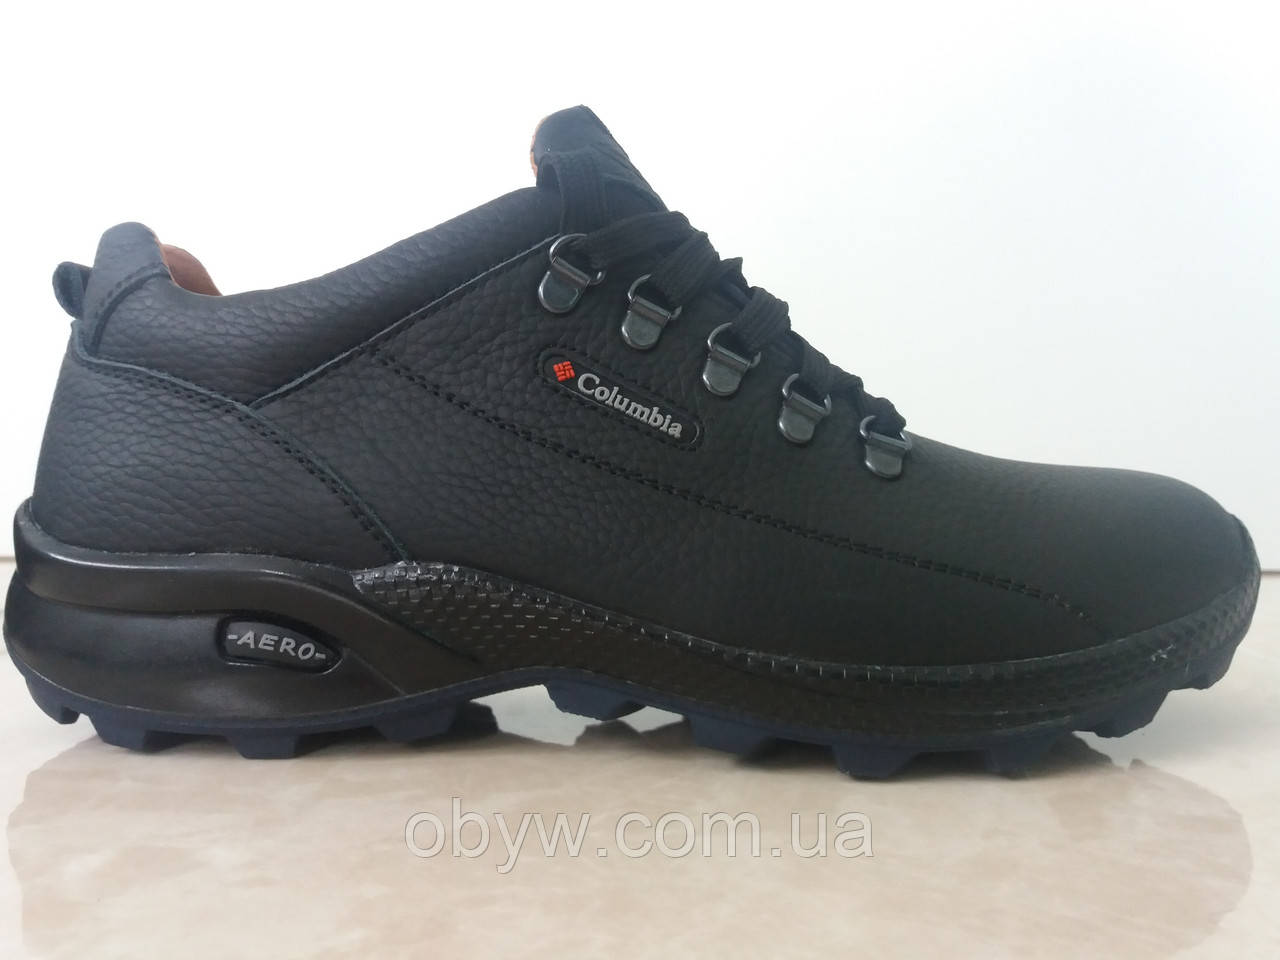 17333b80d8ac Кожаная обувь Calambia n 67  продажа, цена в Днепре. туфли мужские ...